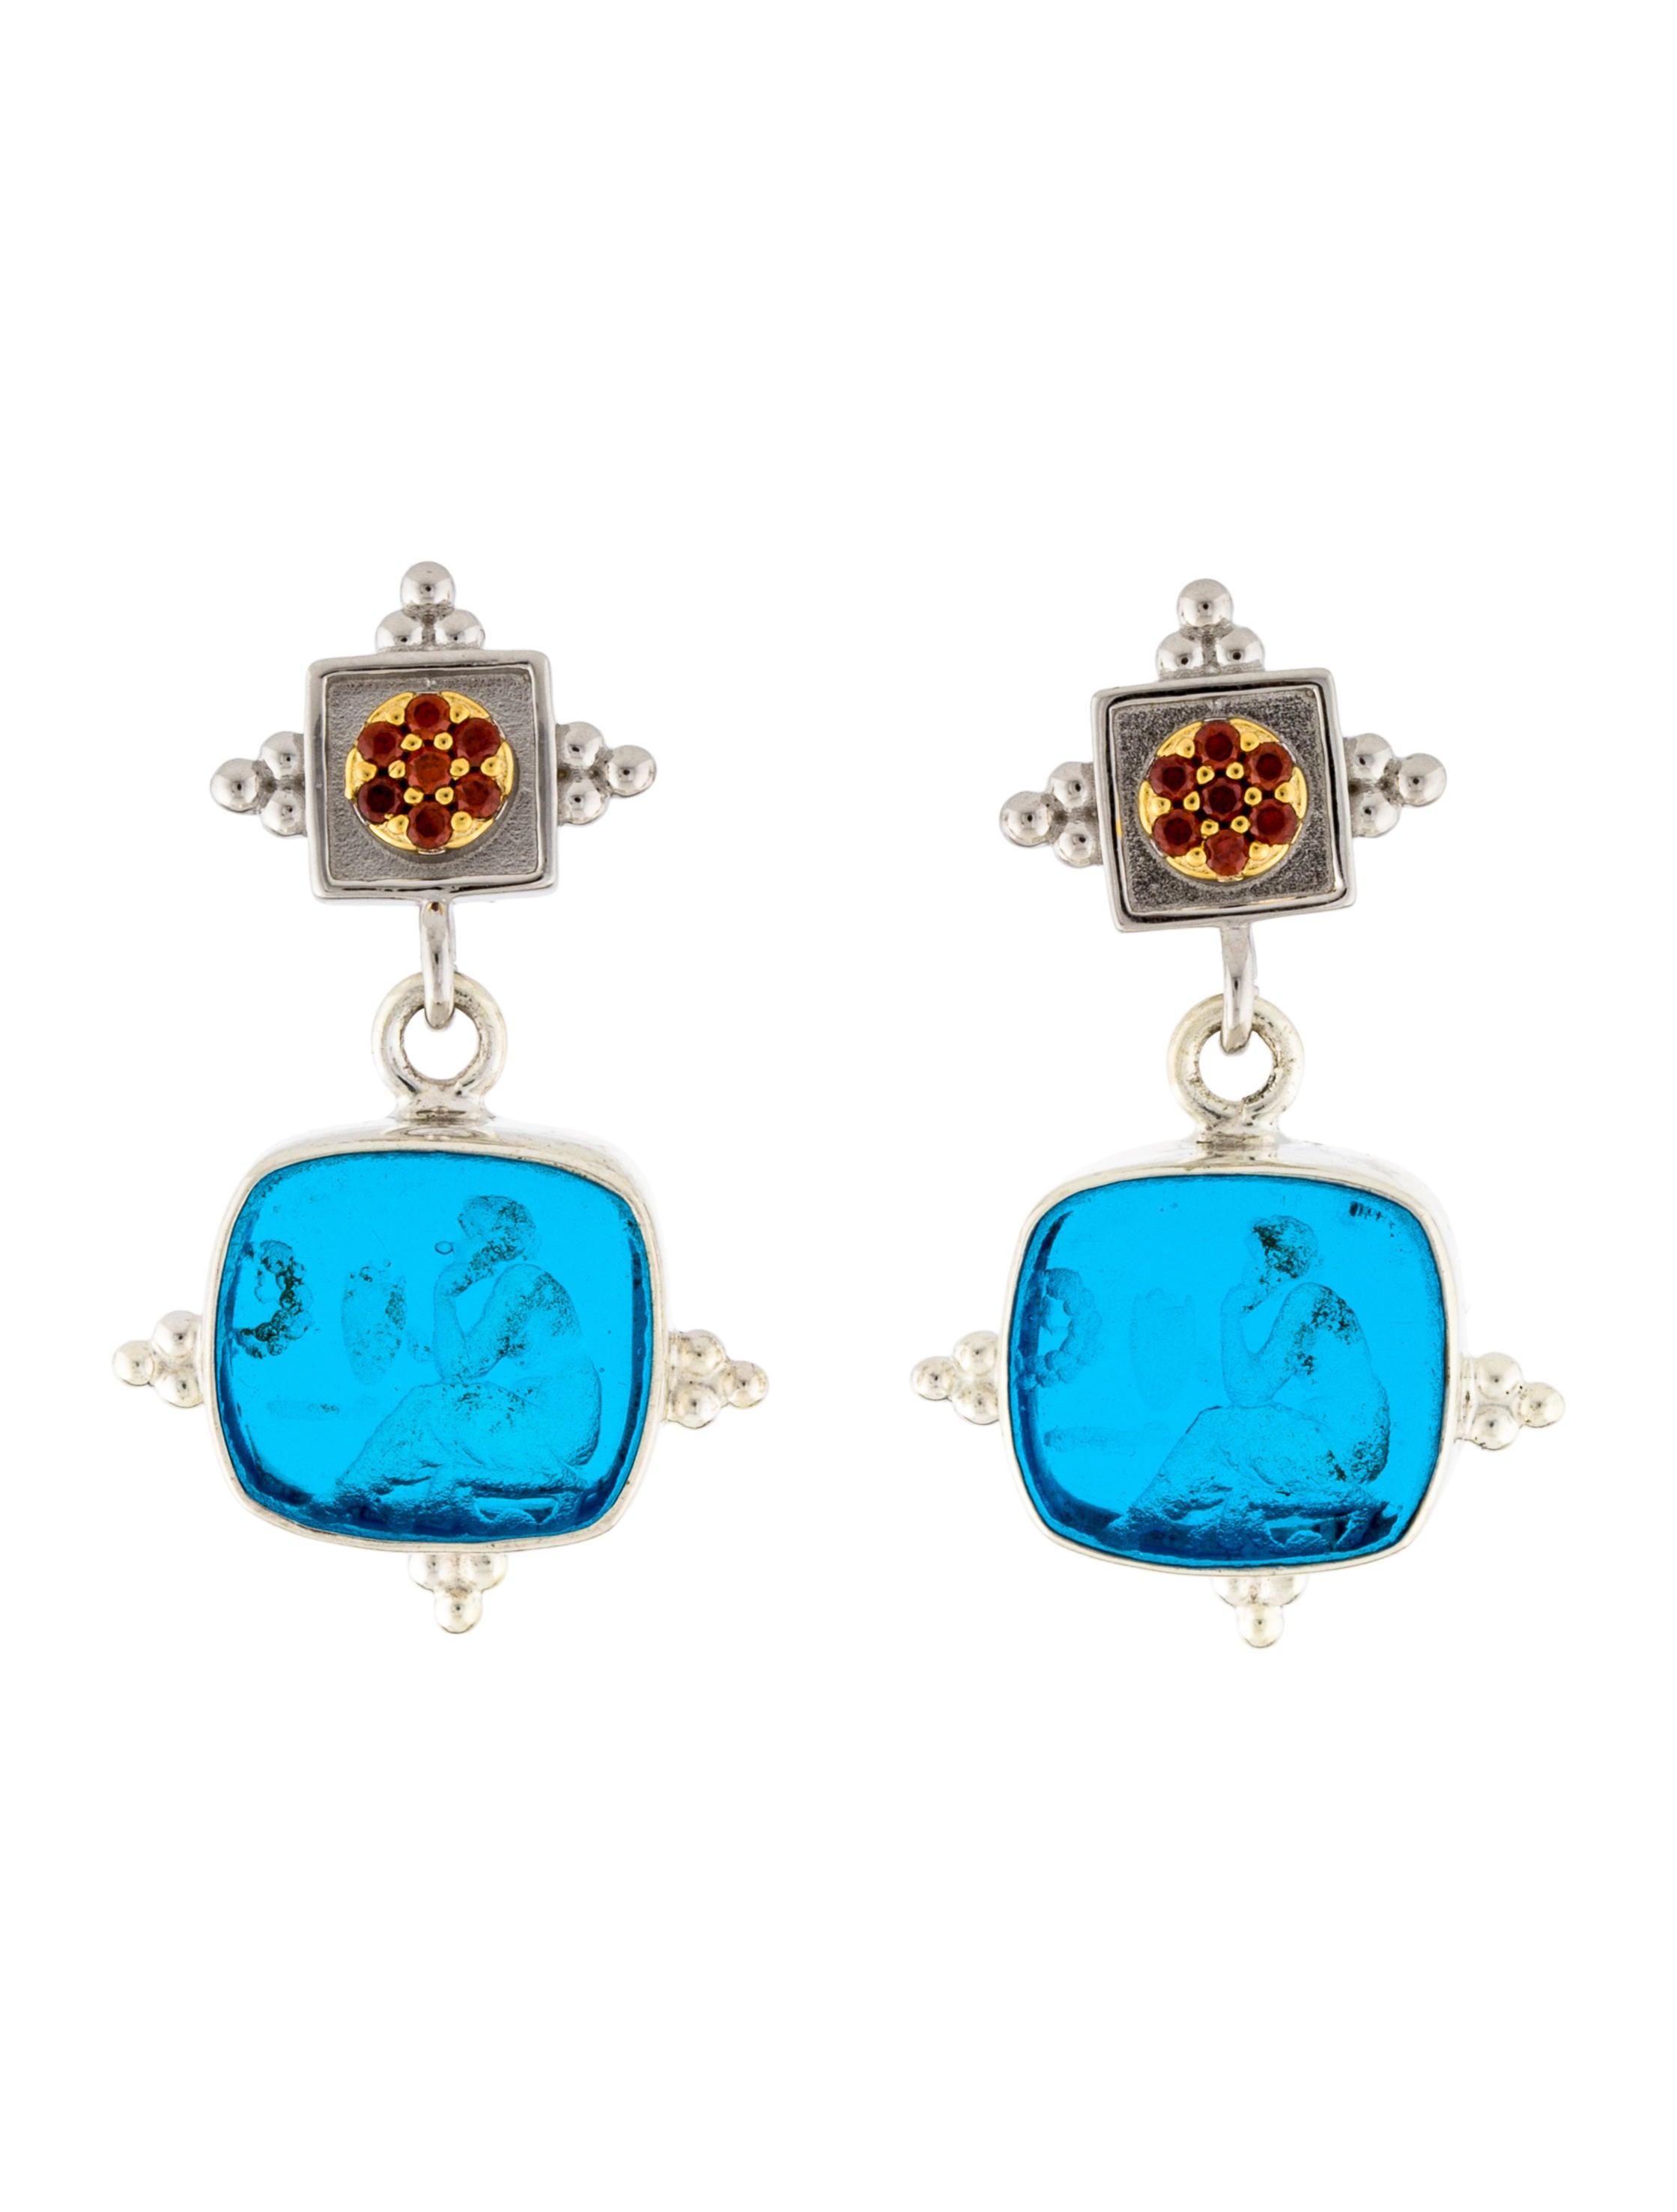 Solid 925 Sterling Silver Wrap Around Gemstone Beads Drop Dangle Earrings